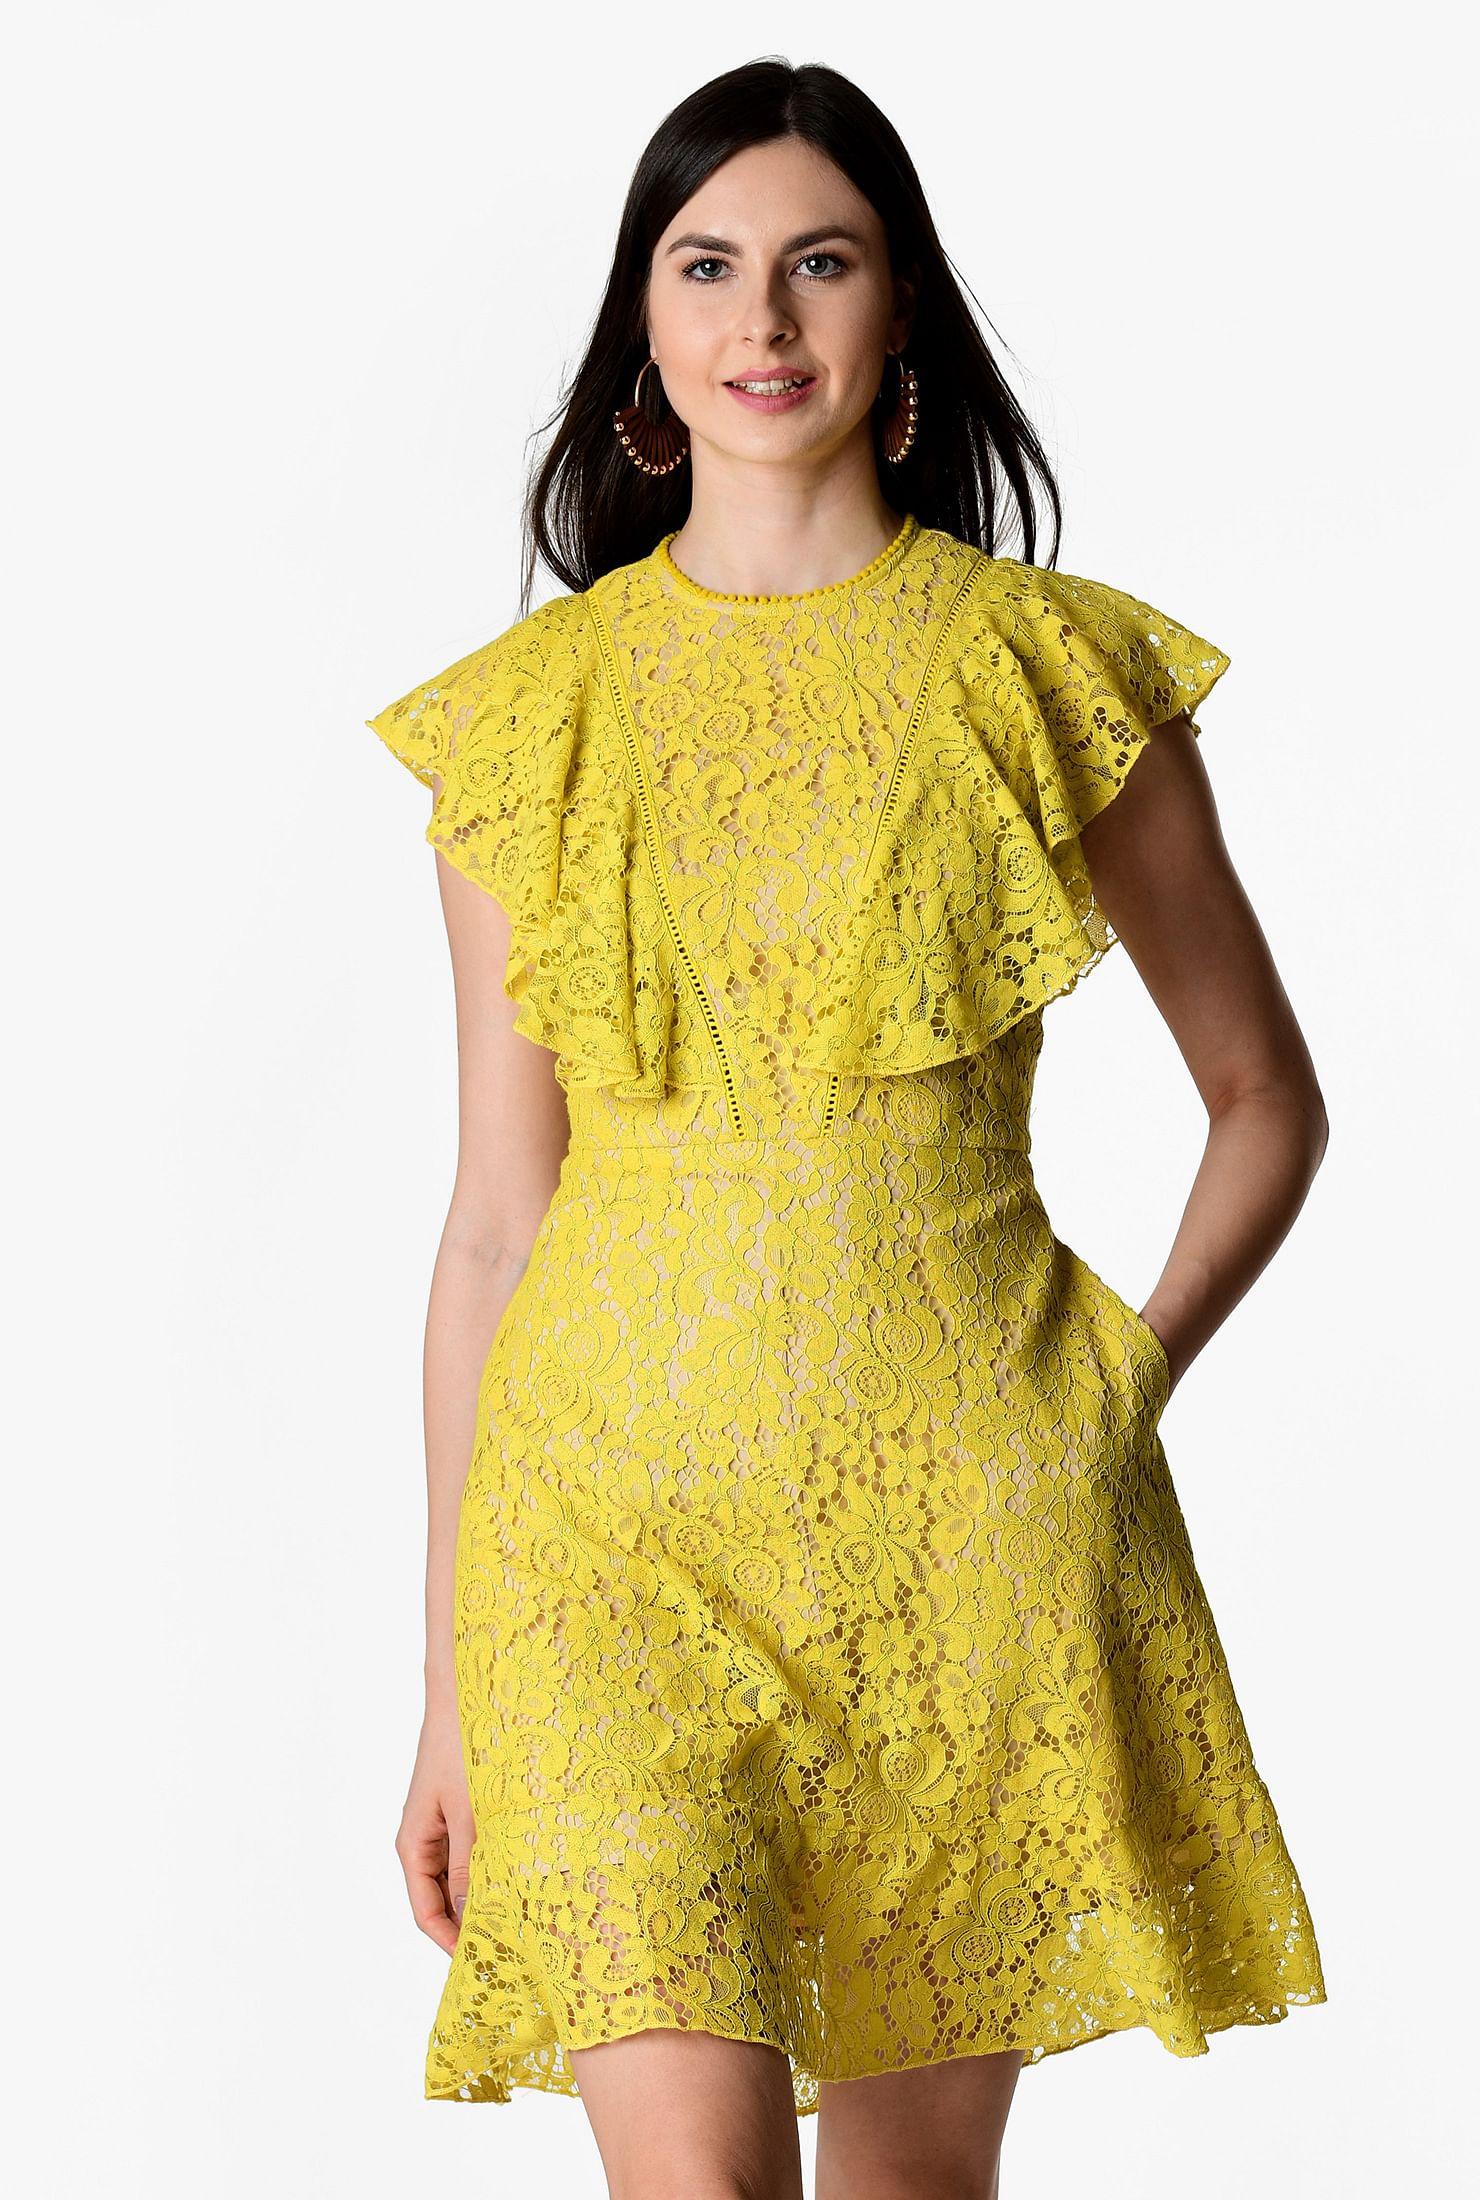 Cute Petite Plus Size Dresses